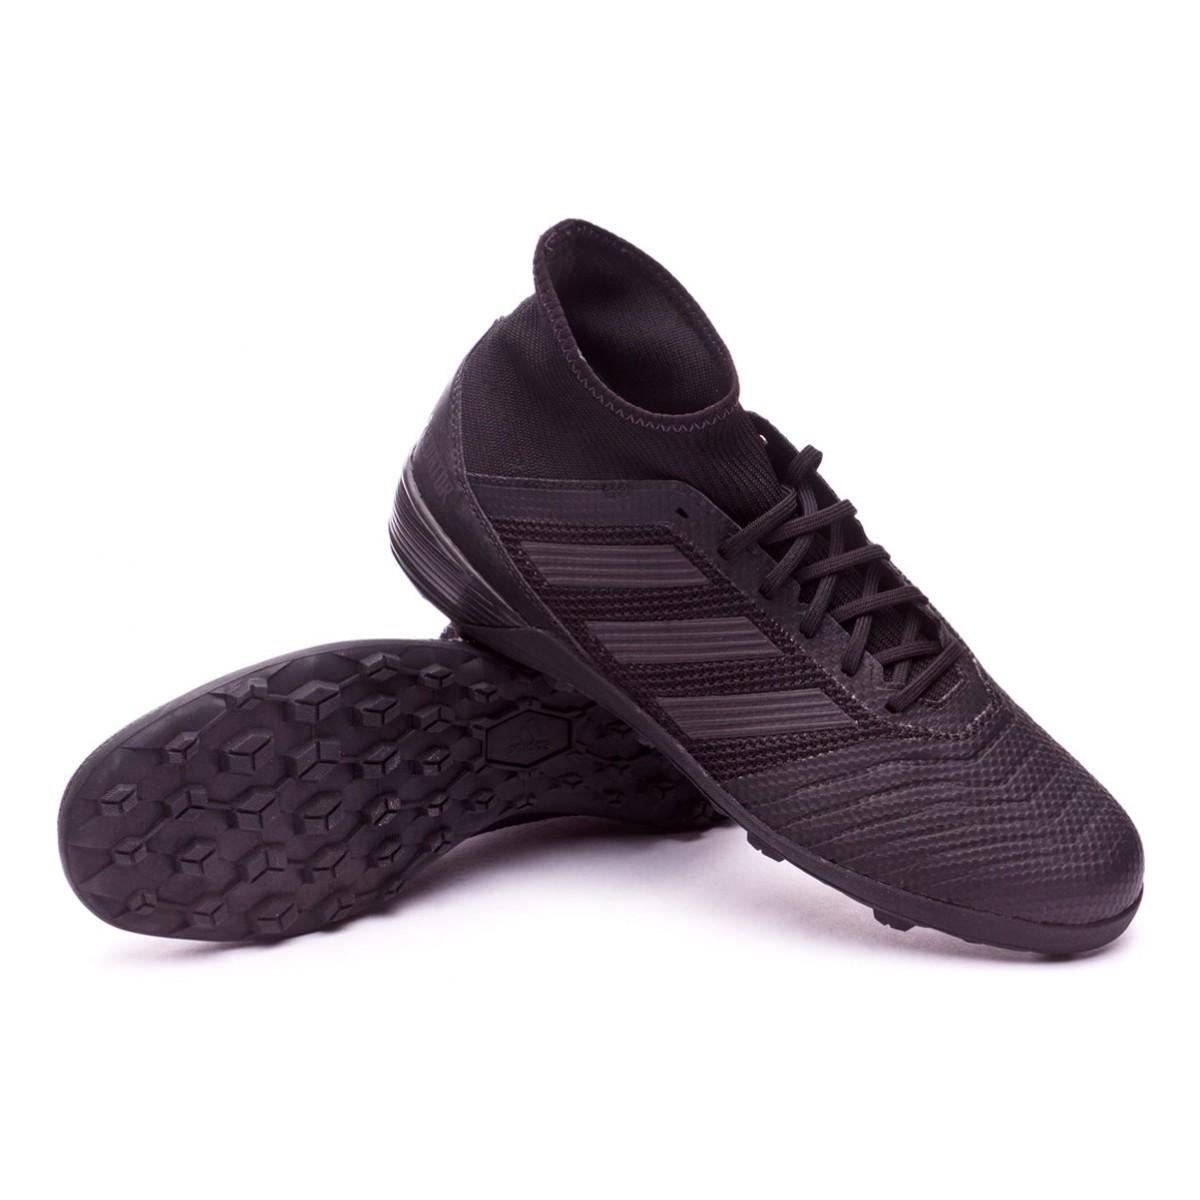 c13dd1366 ... release date football boot adidas predator tango 18.3 turf core black  utility fafa8 98b5b ...